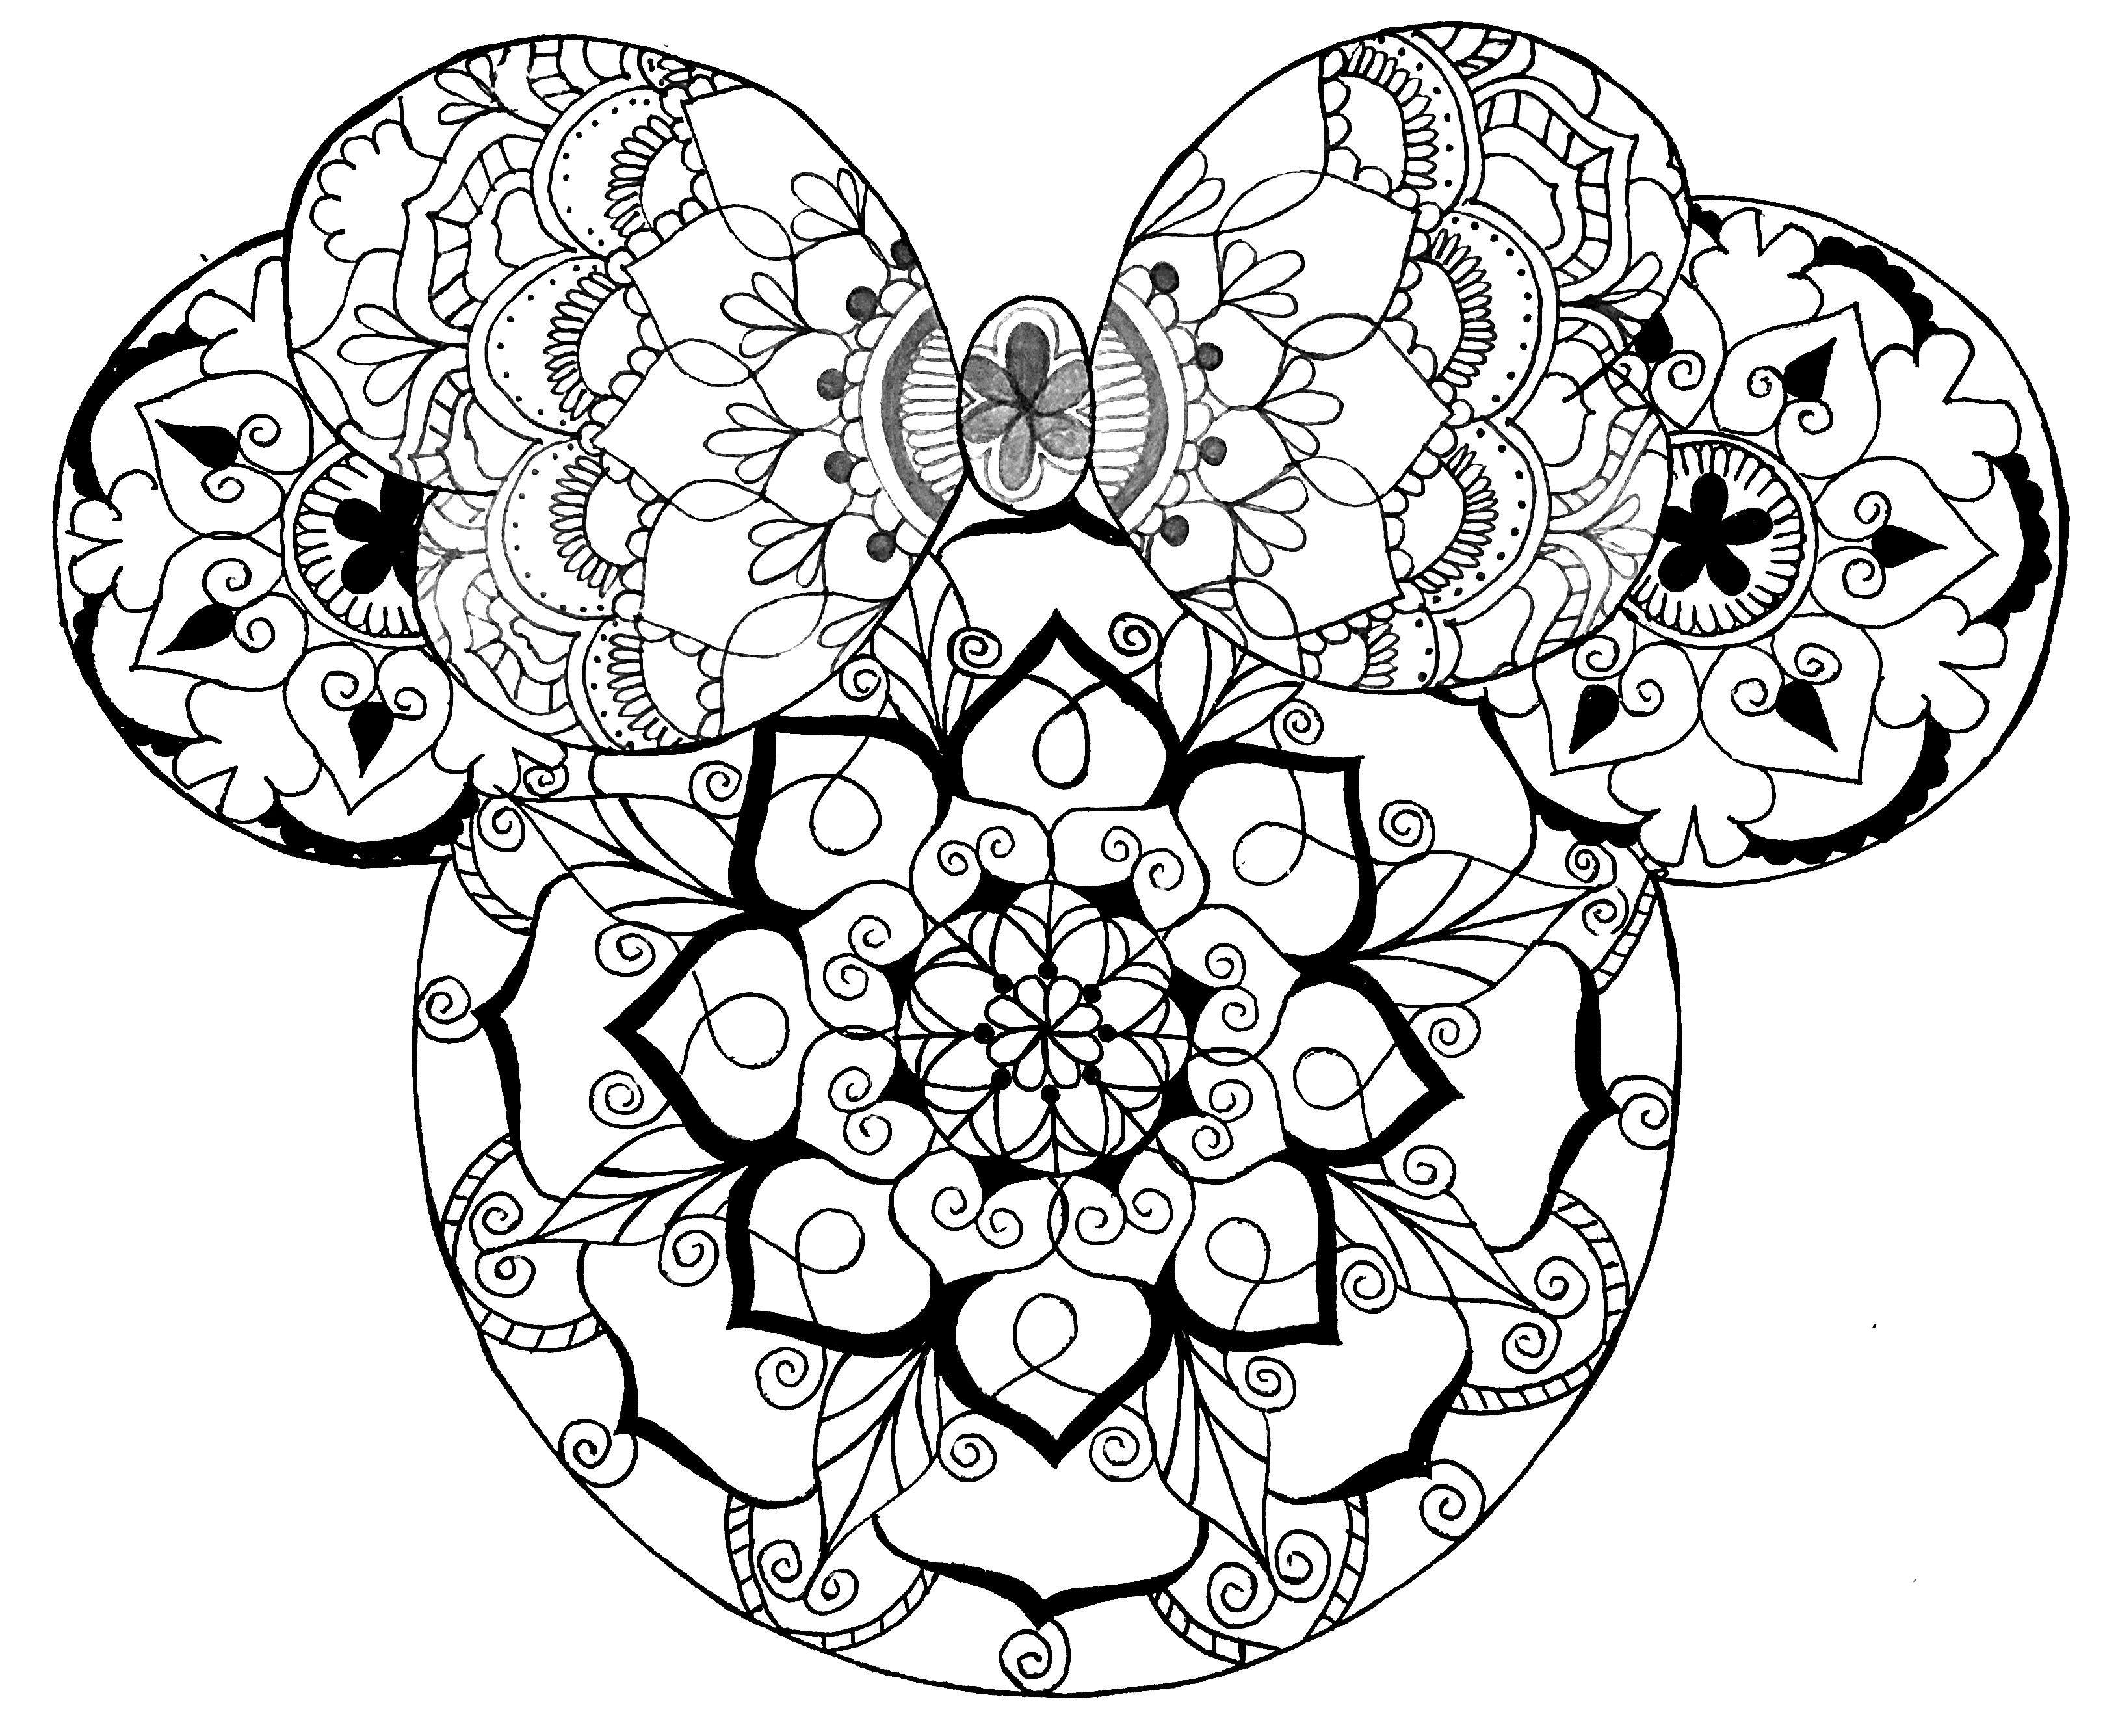 Zentangle Mandala Love All Things Mandala Mandala Inspiration Mandala Art Mandala Mickey Mouse Coloring Pages Mandala Coloring Pages Disney Coloring Pages [ 2670 x 3258 Pixel ]